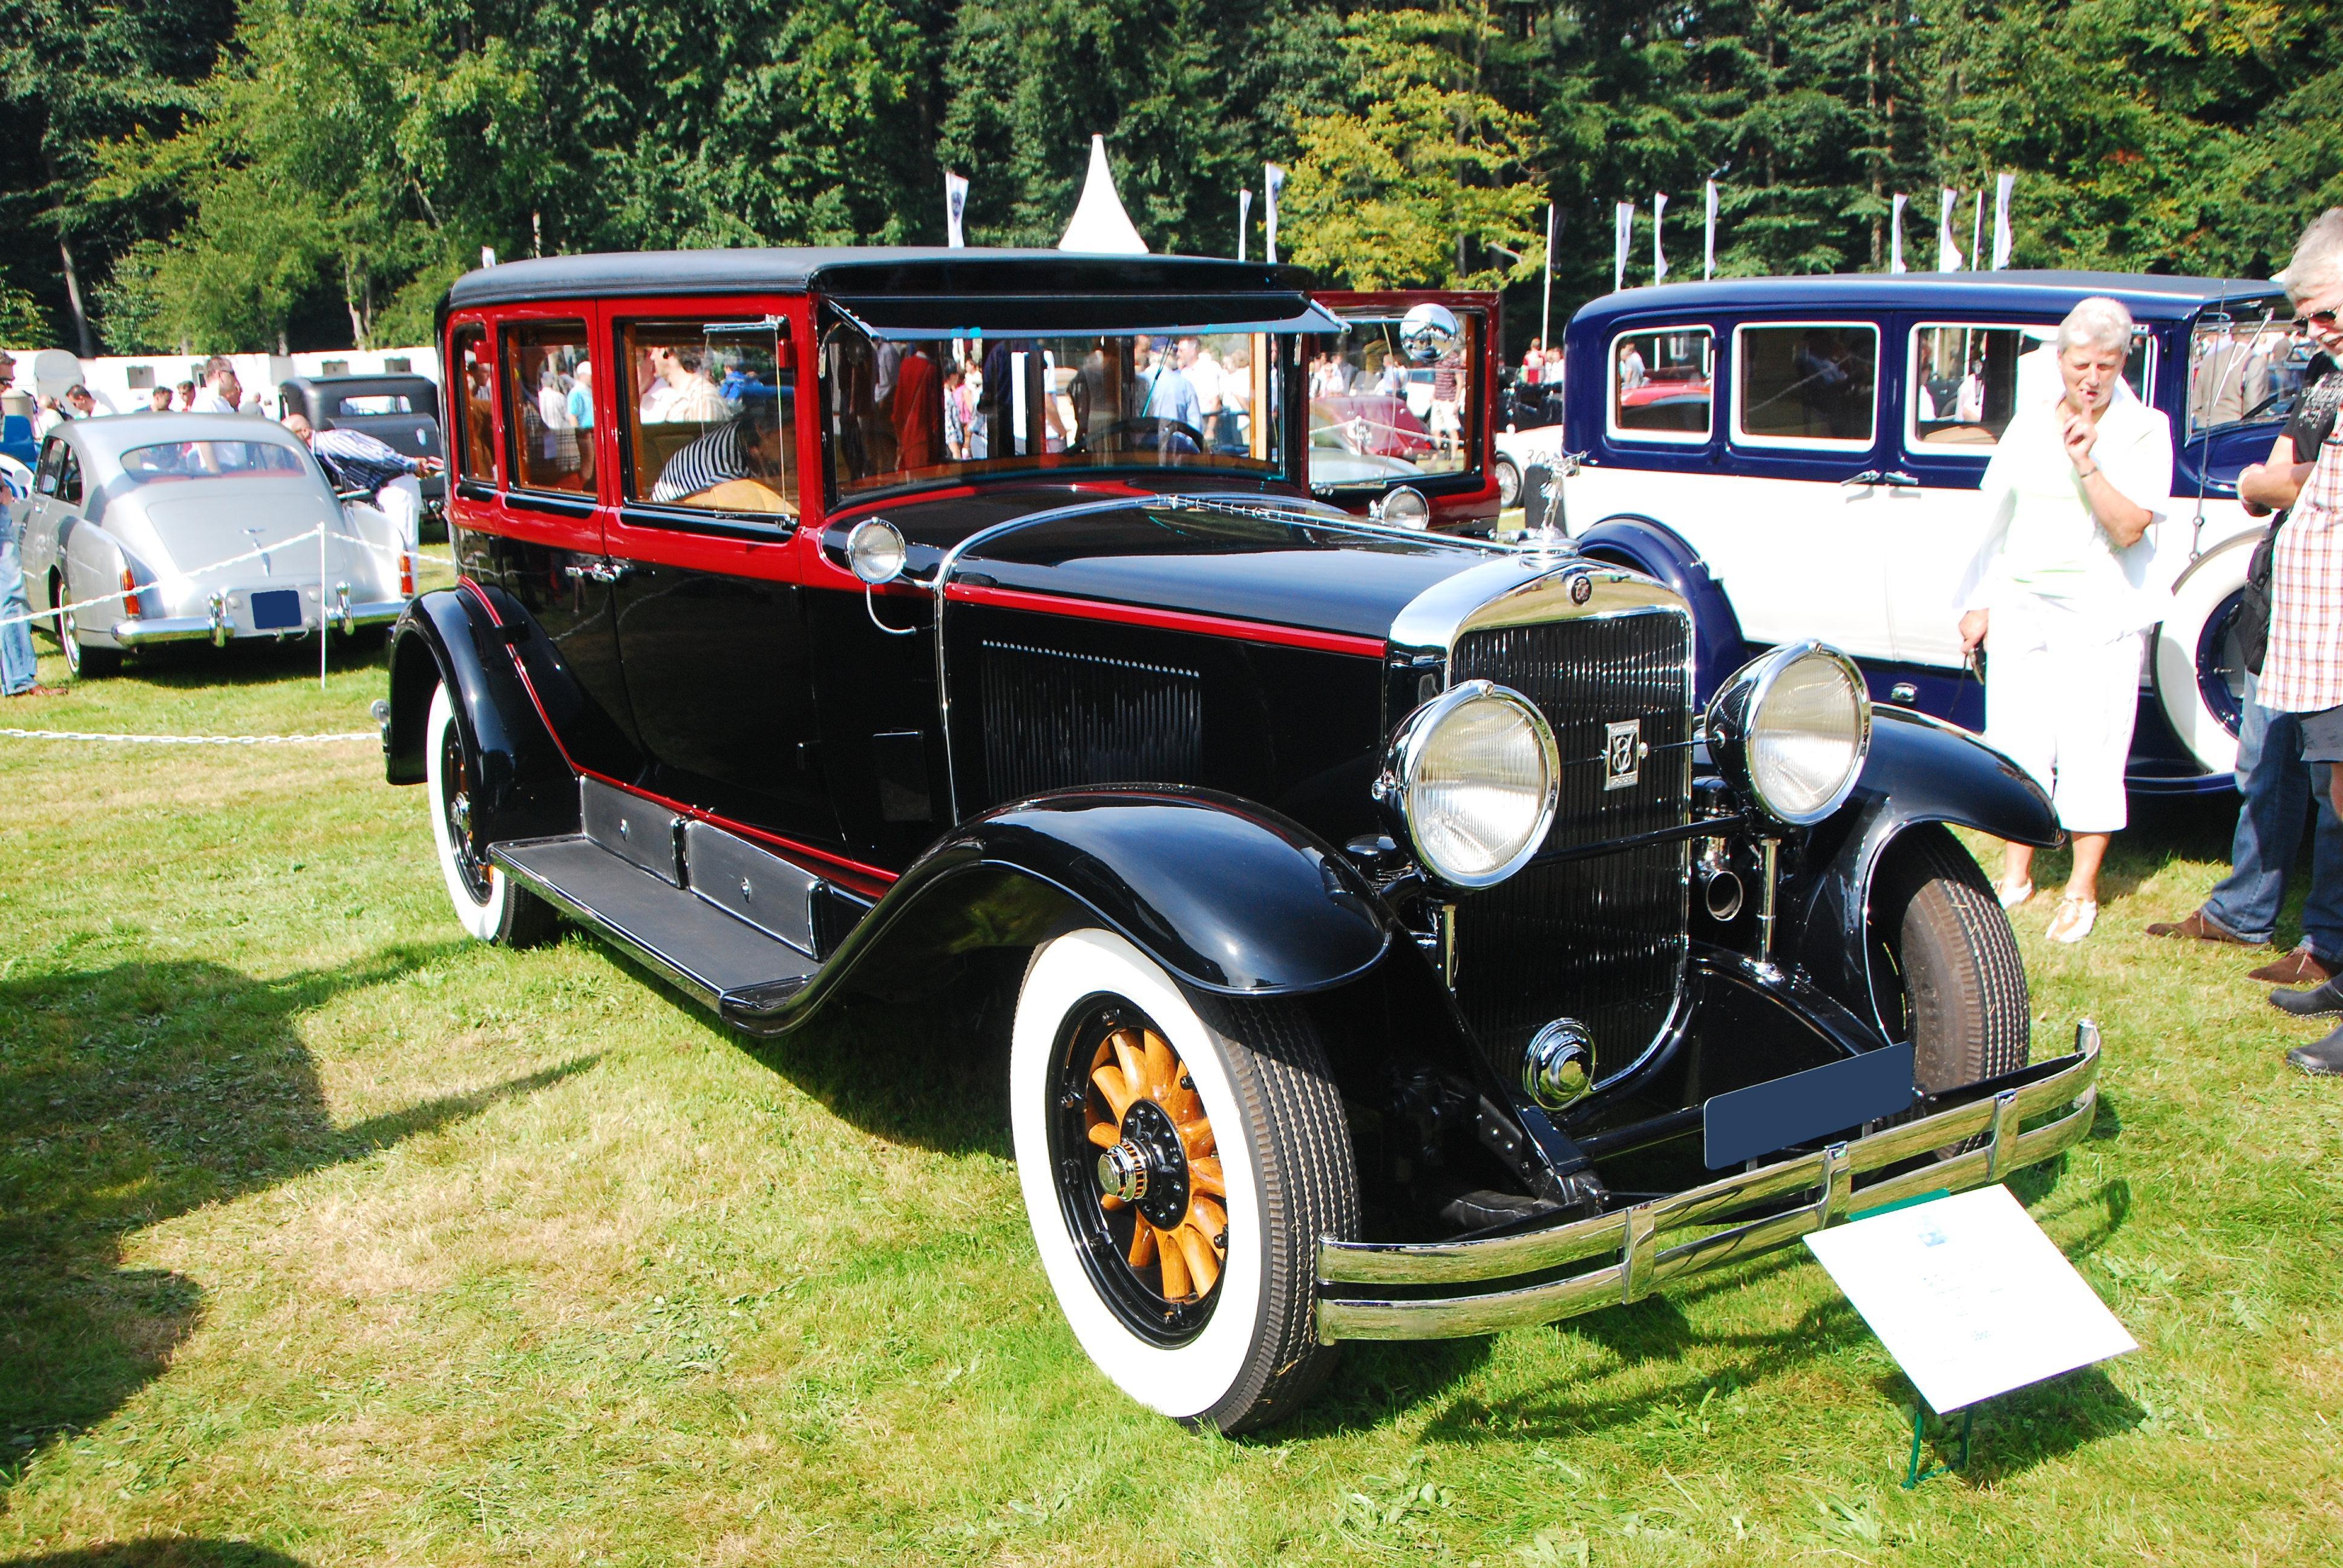 File:Cadillac 341-a.jpg - Wikimedia Commons